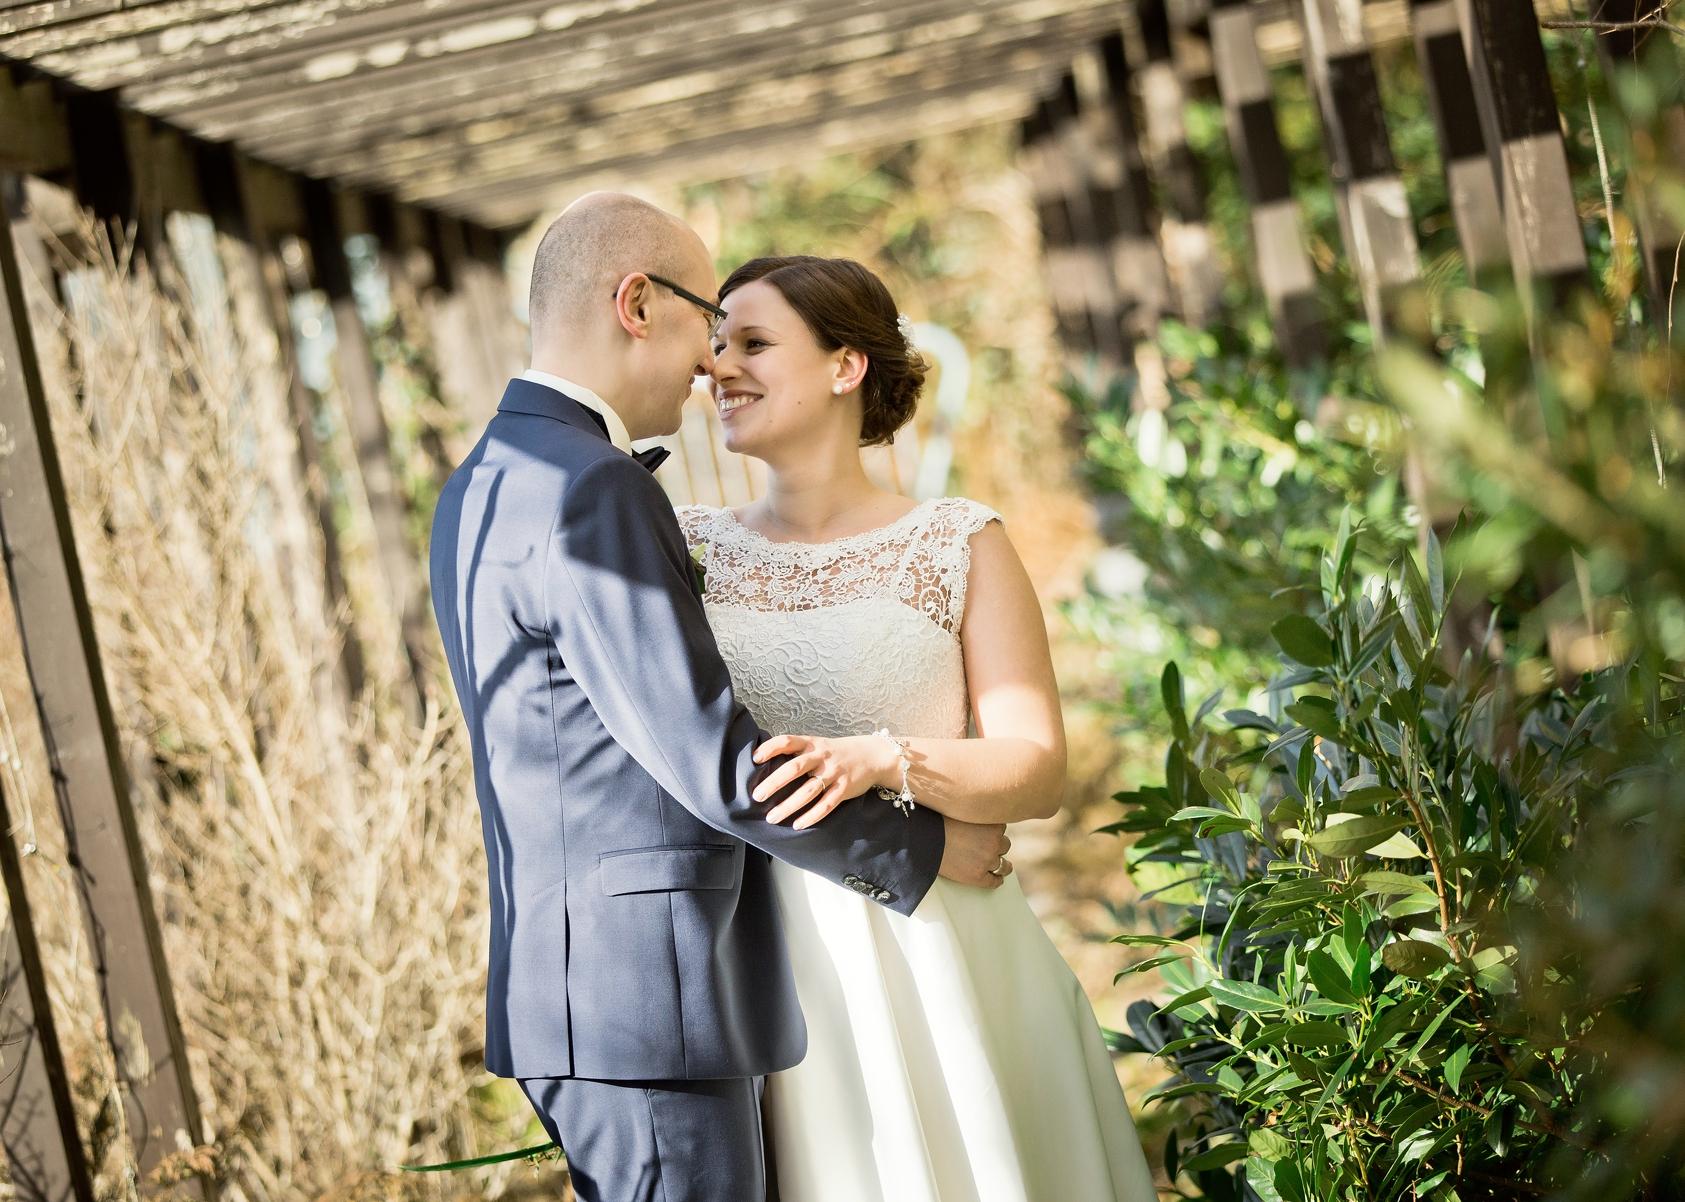 Fotograf Hochzeit in zschopau